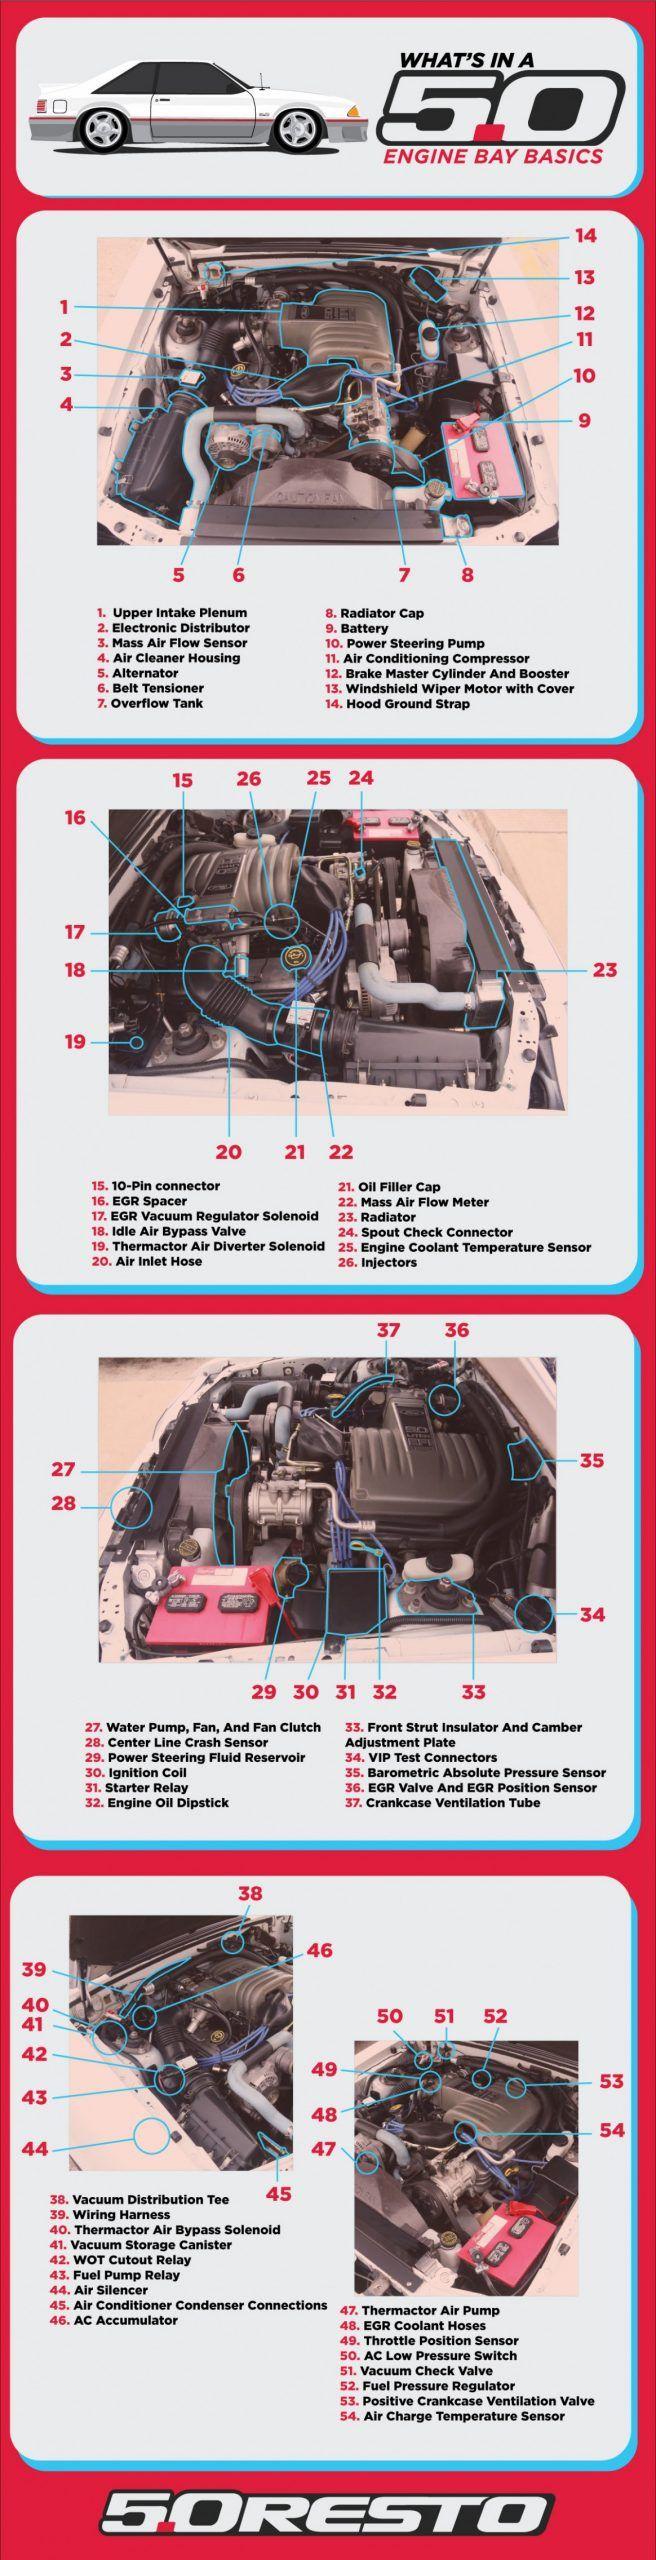 images?q=tbn:ANd9GcQh_l3eQ5xwiPy07kGEXjmjgmBKBRB7H2mRxCGhv1tFWg5c_mWT Engine Compartment Honda Accord Engine Parts Diagram